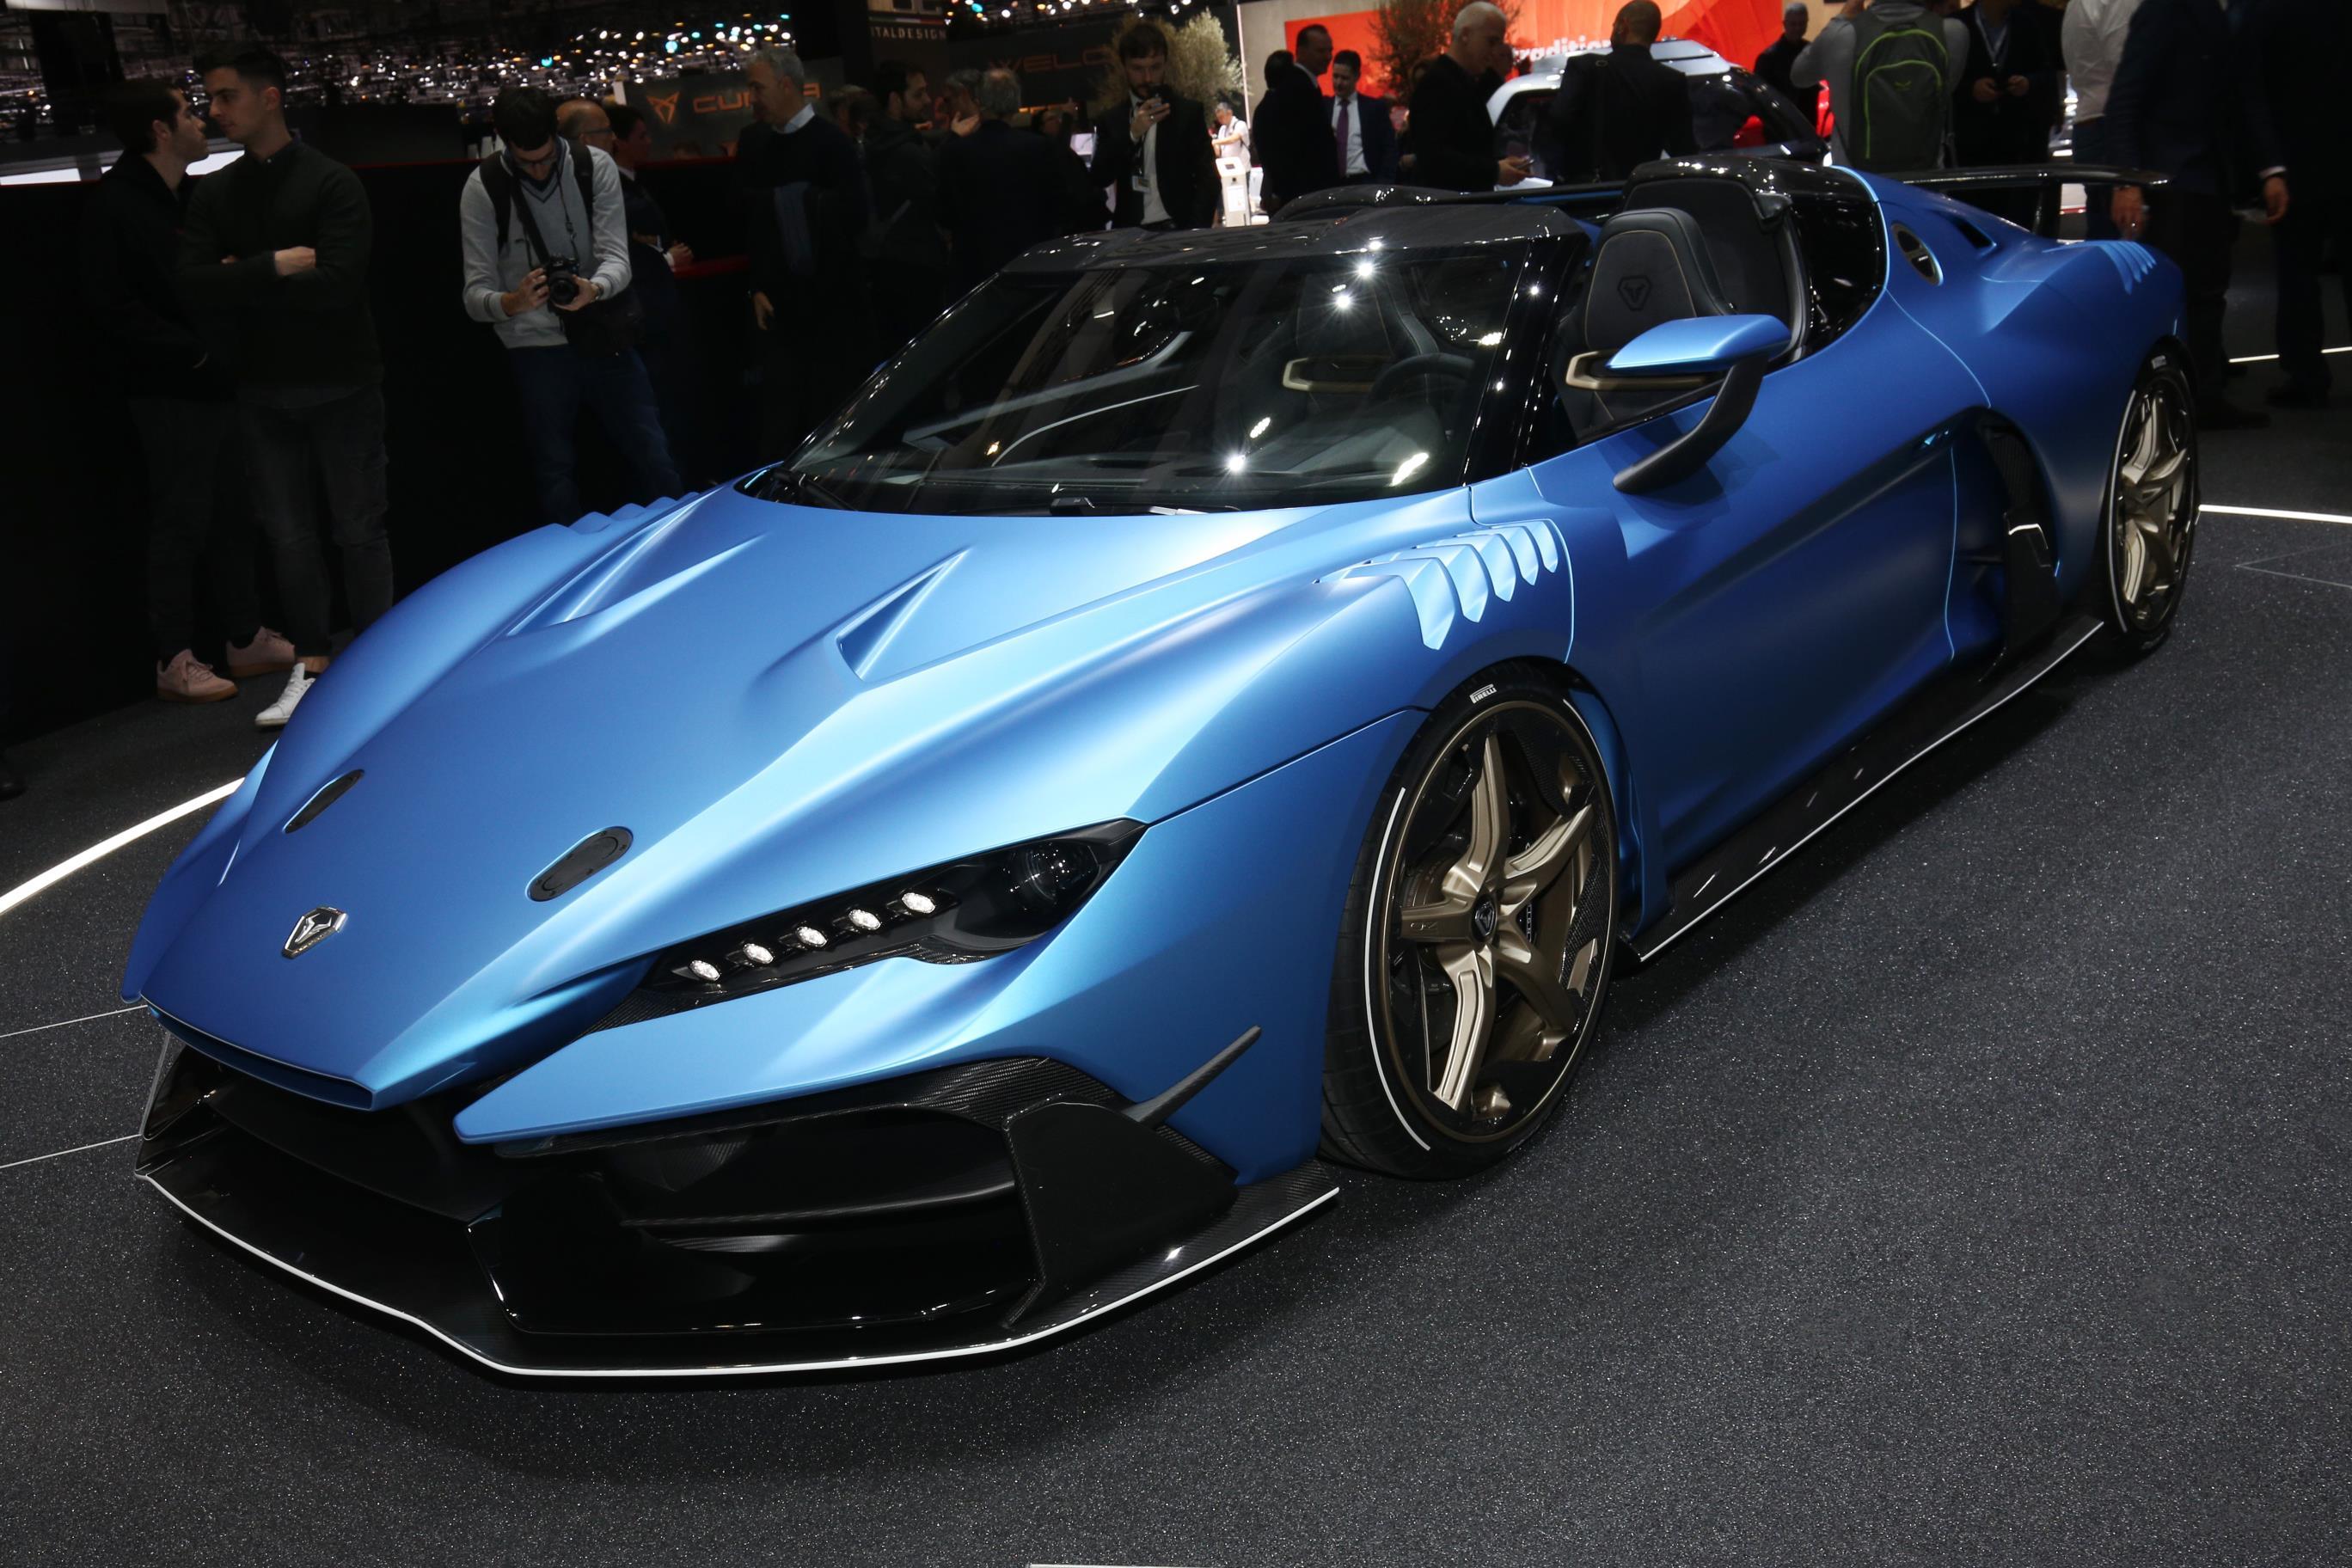 Geneva Motor Show 2018 Mega Gallery Part 1 (347)